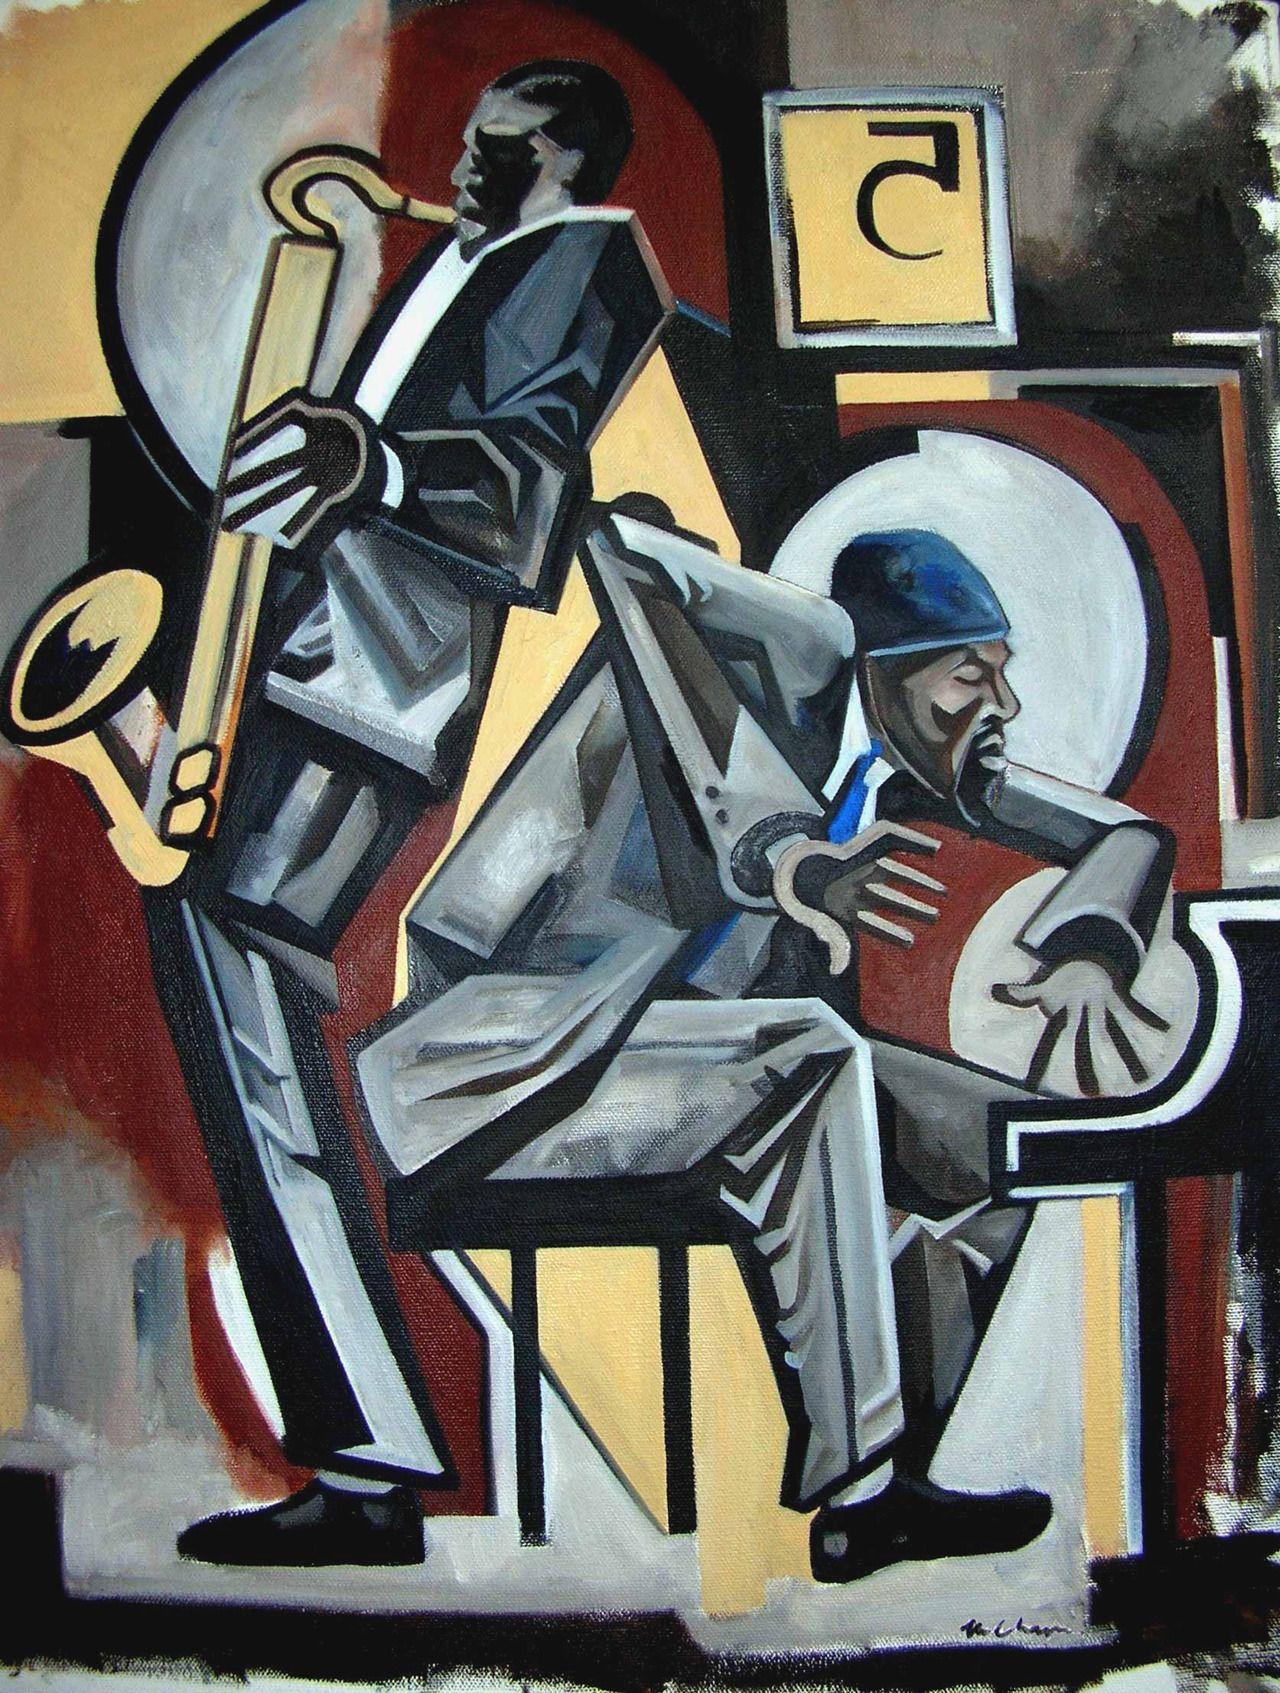 Martel Chapman Monk and Coltrane, Five Spot, 1957 New